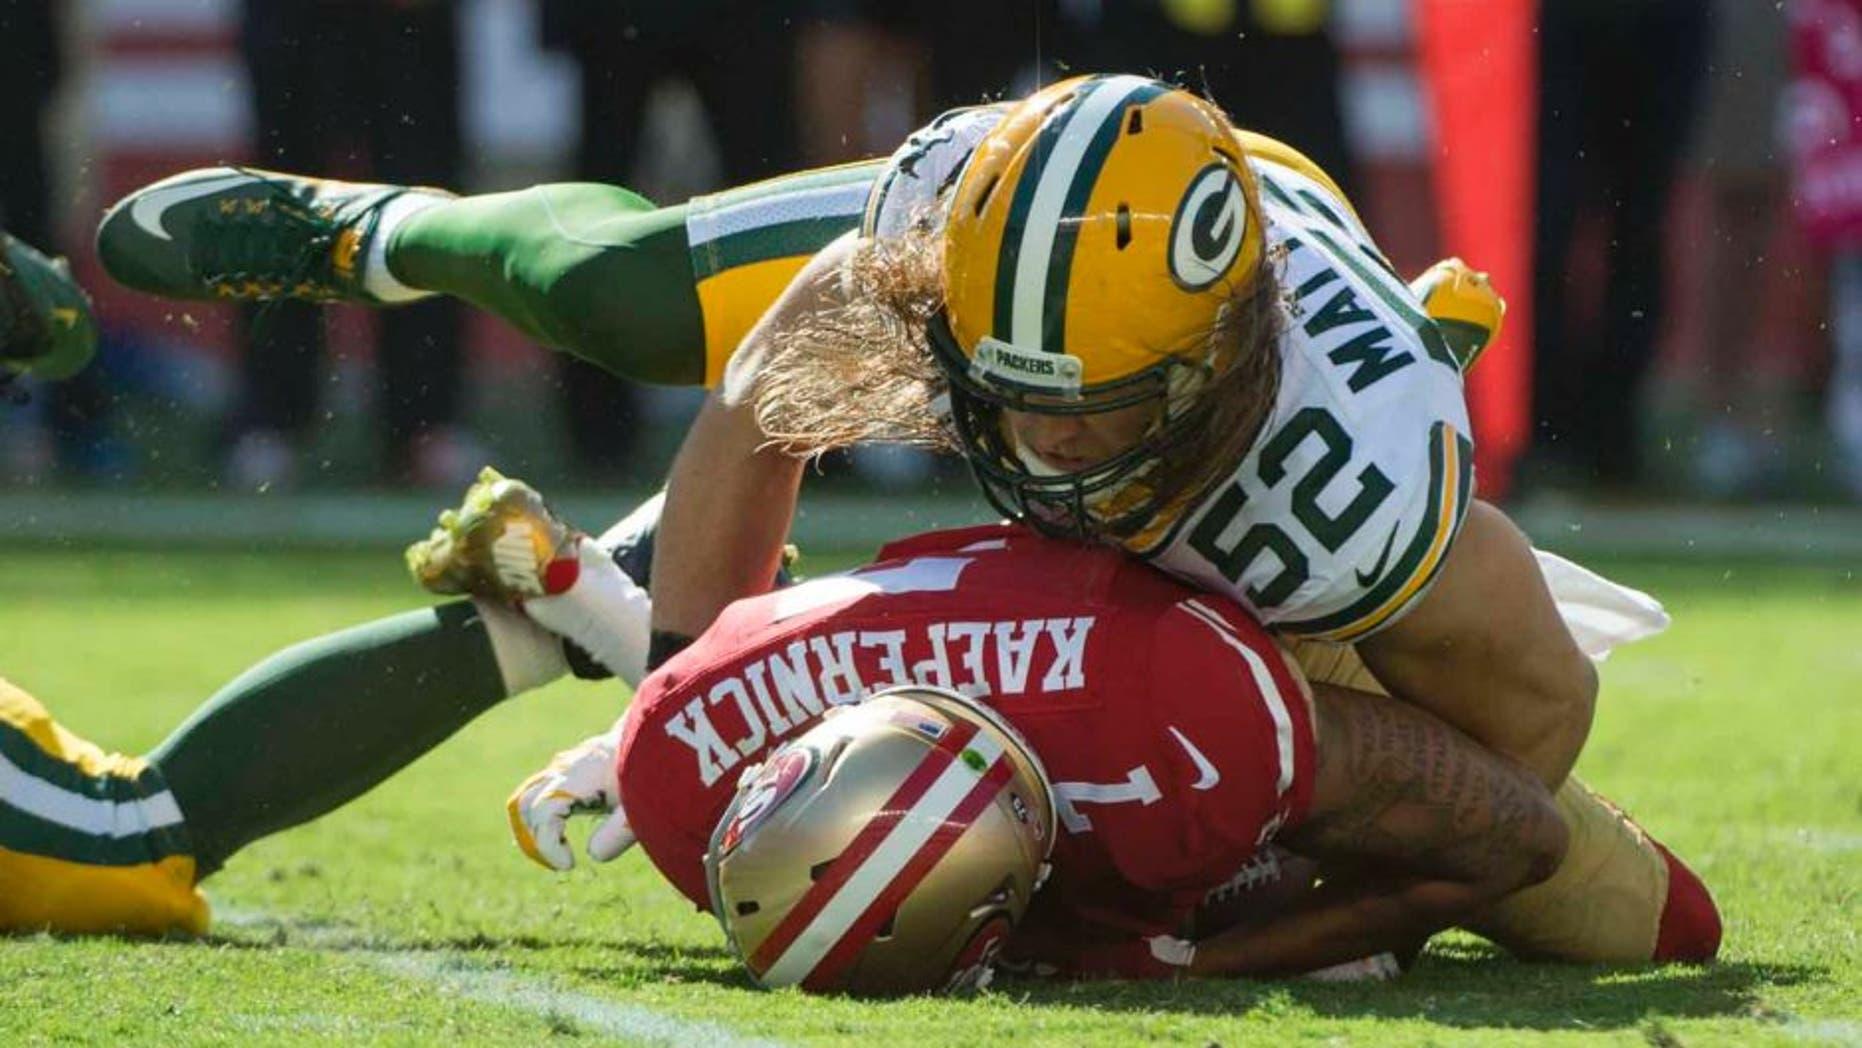 Green Bay Packers inside linebacker Clay Matthews sacks San Francisco 49ers quarterback Colin Kaepernick during the third quarter at Levi's Stadium in Santa Clara, Calif., on Sunday, Oct. 4, 2015.